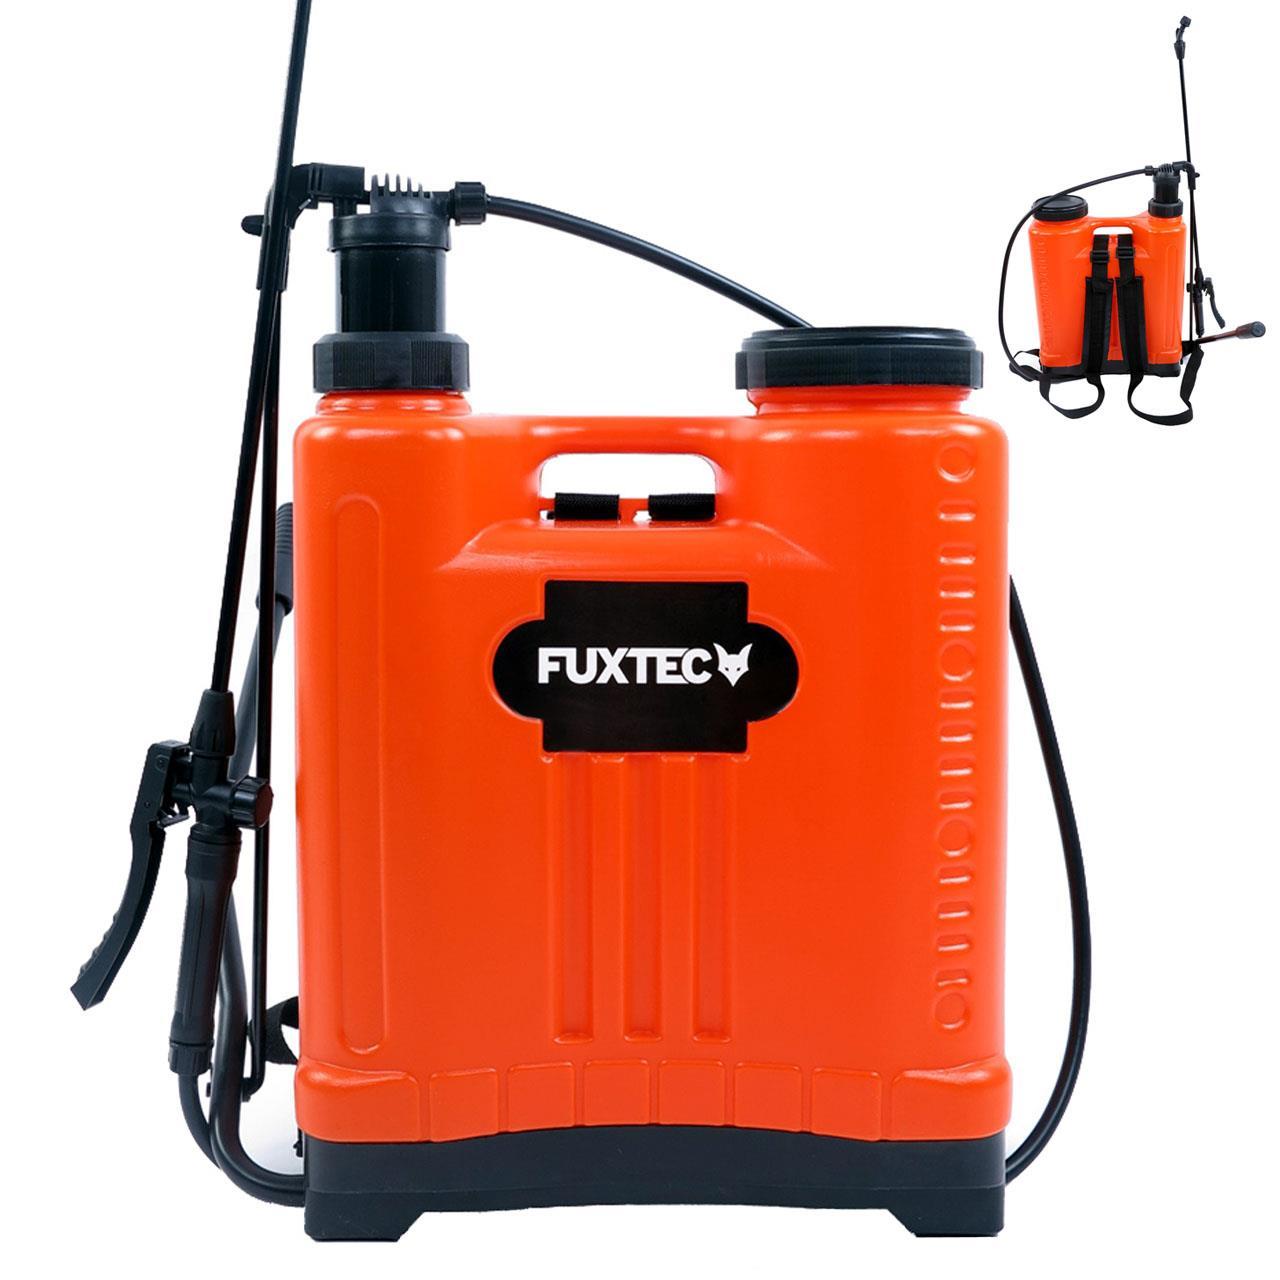 B-Ware FUXTEC Drucksprüher 20 Liter FX-DS20L